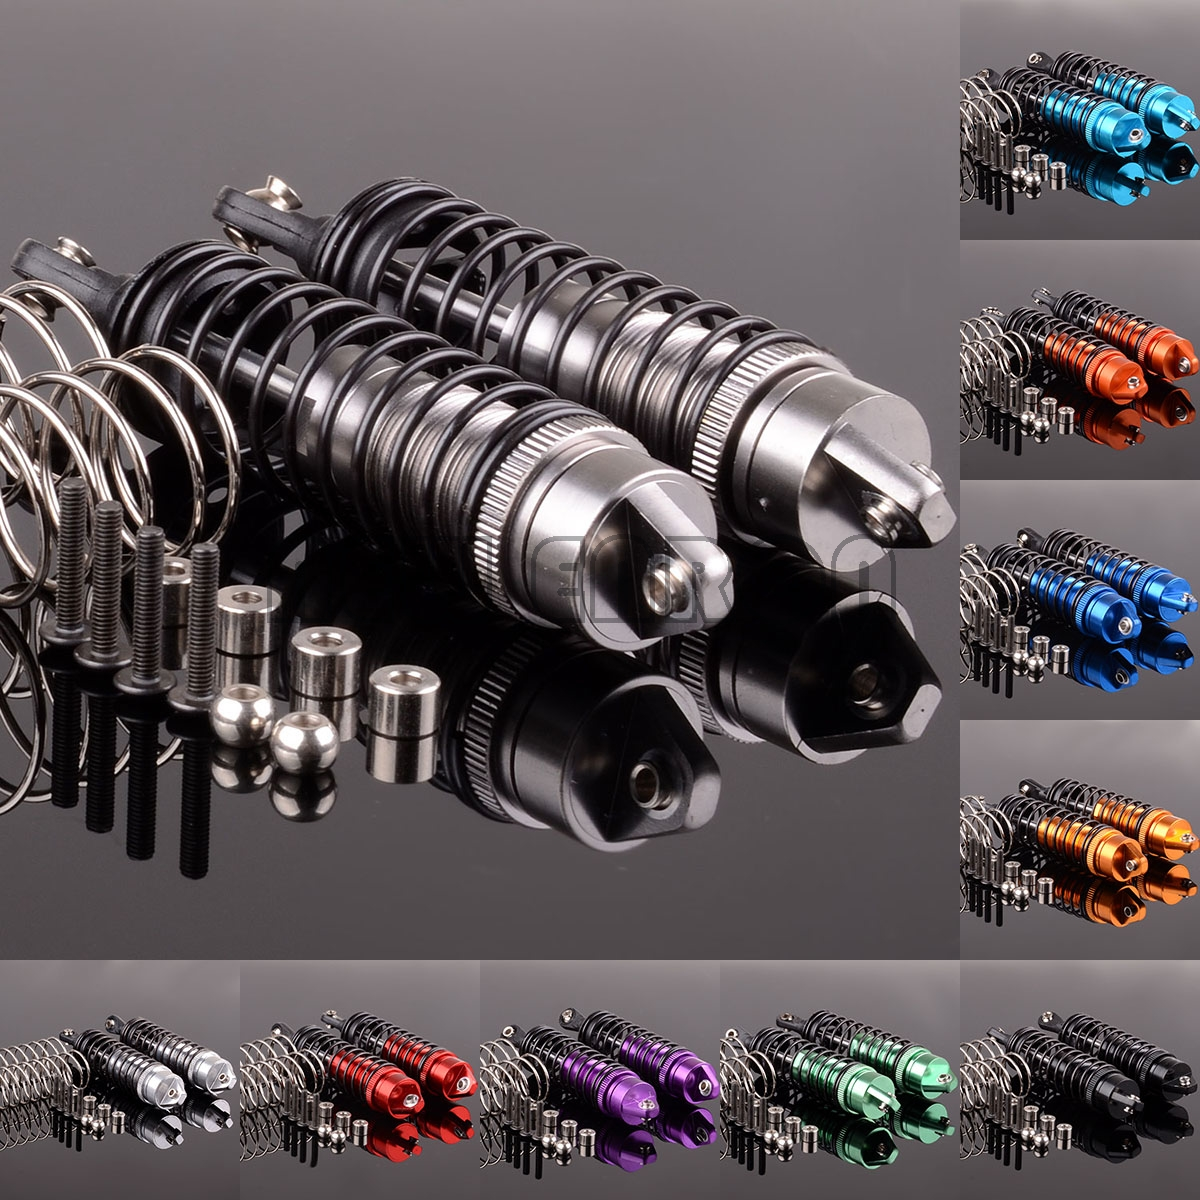 NEW ENRON Aluminum Front/Rear Oil Shock Absorber SLA023-24 For RC Traxxas Slash 4x4 Stampede